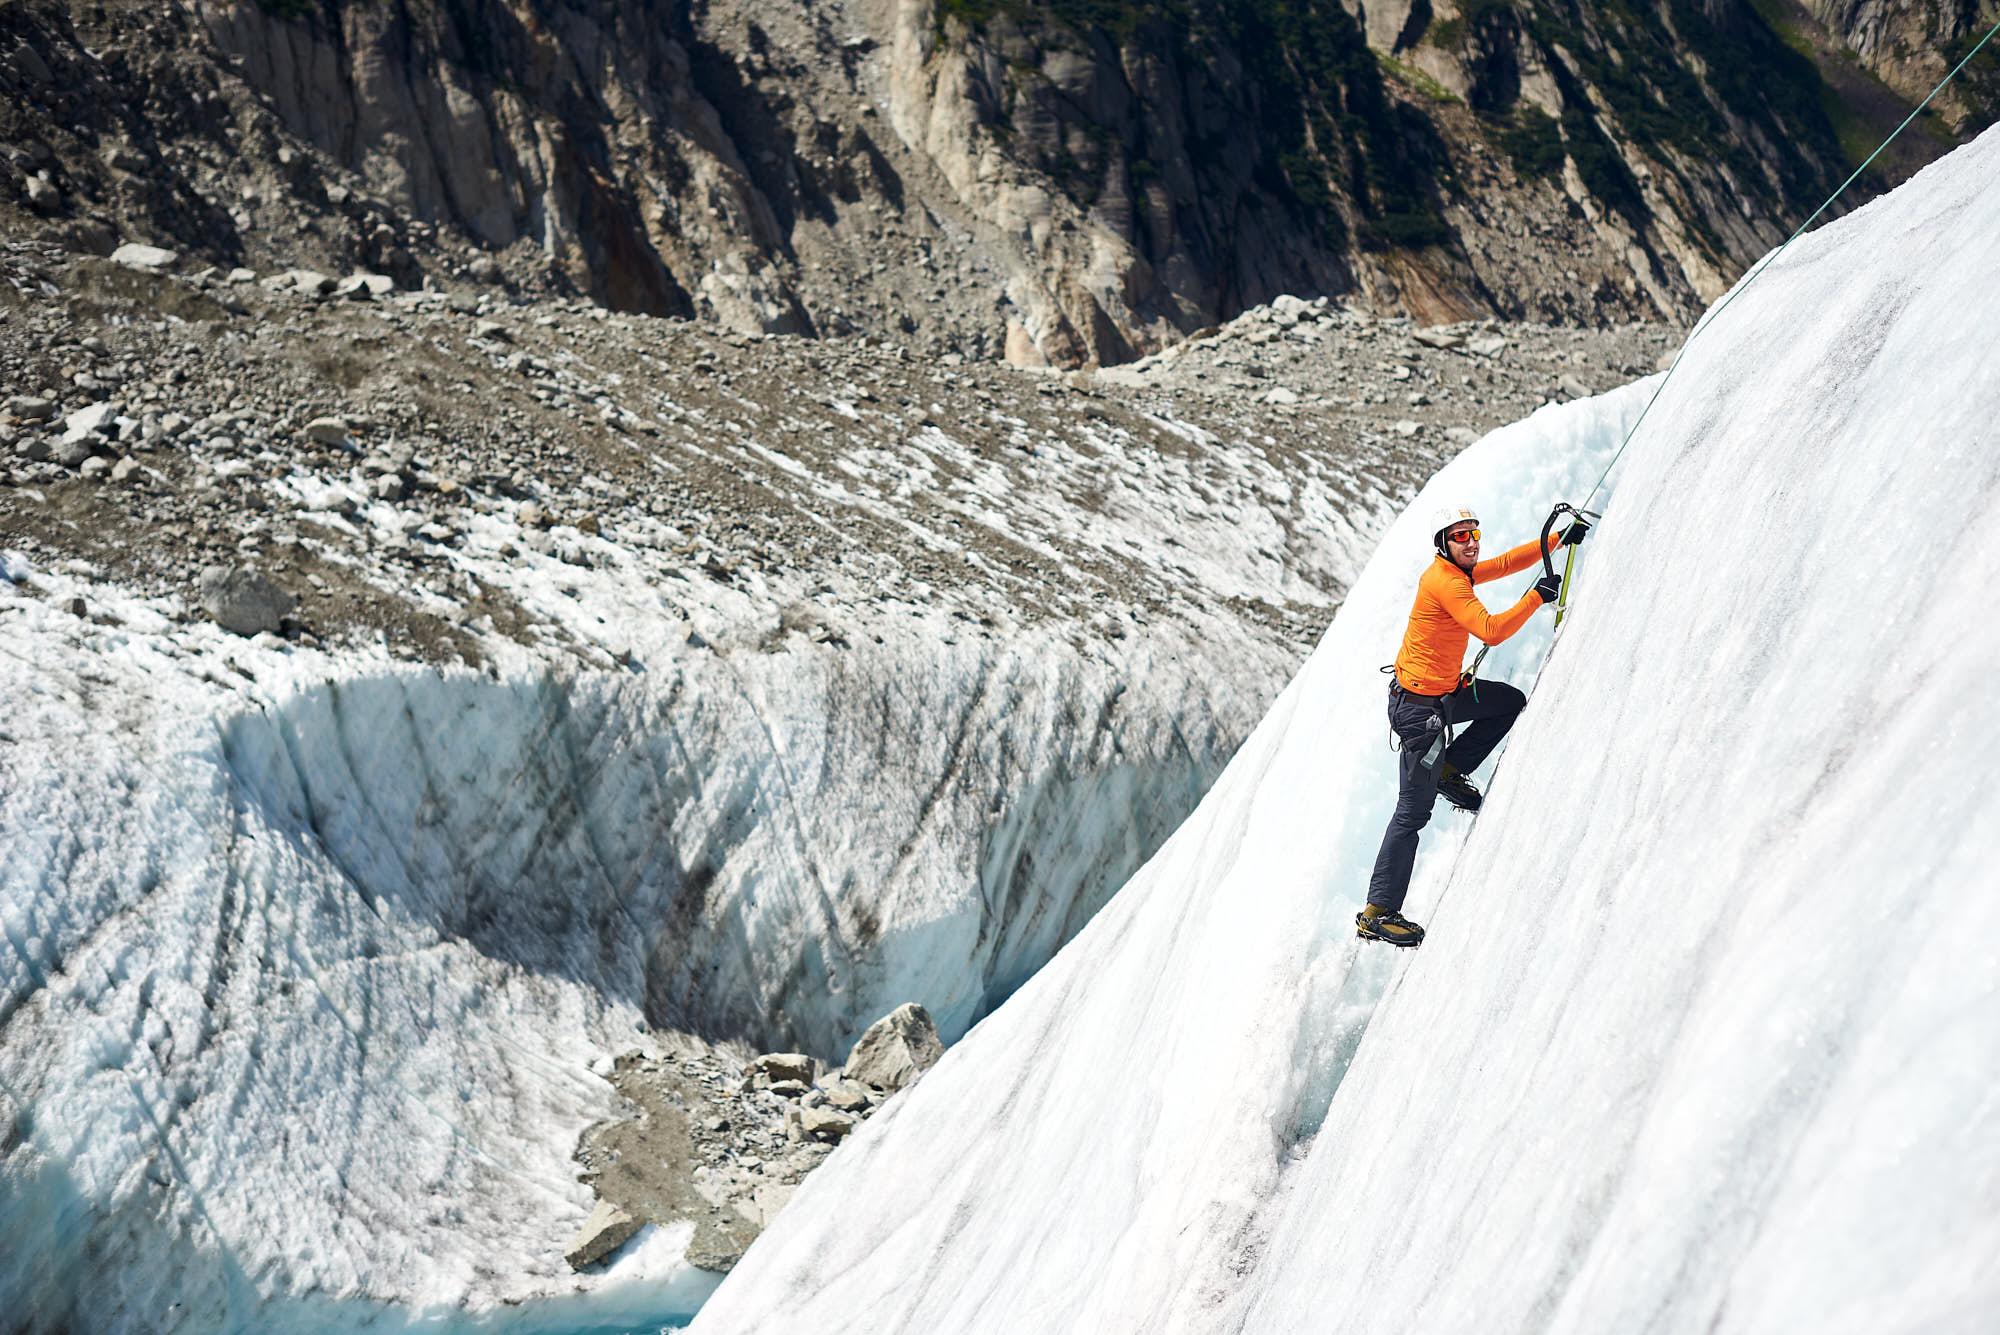 Alpinist ice climbing on the Mer de Glace glacier